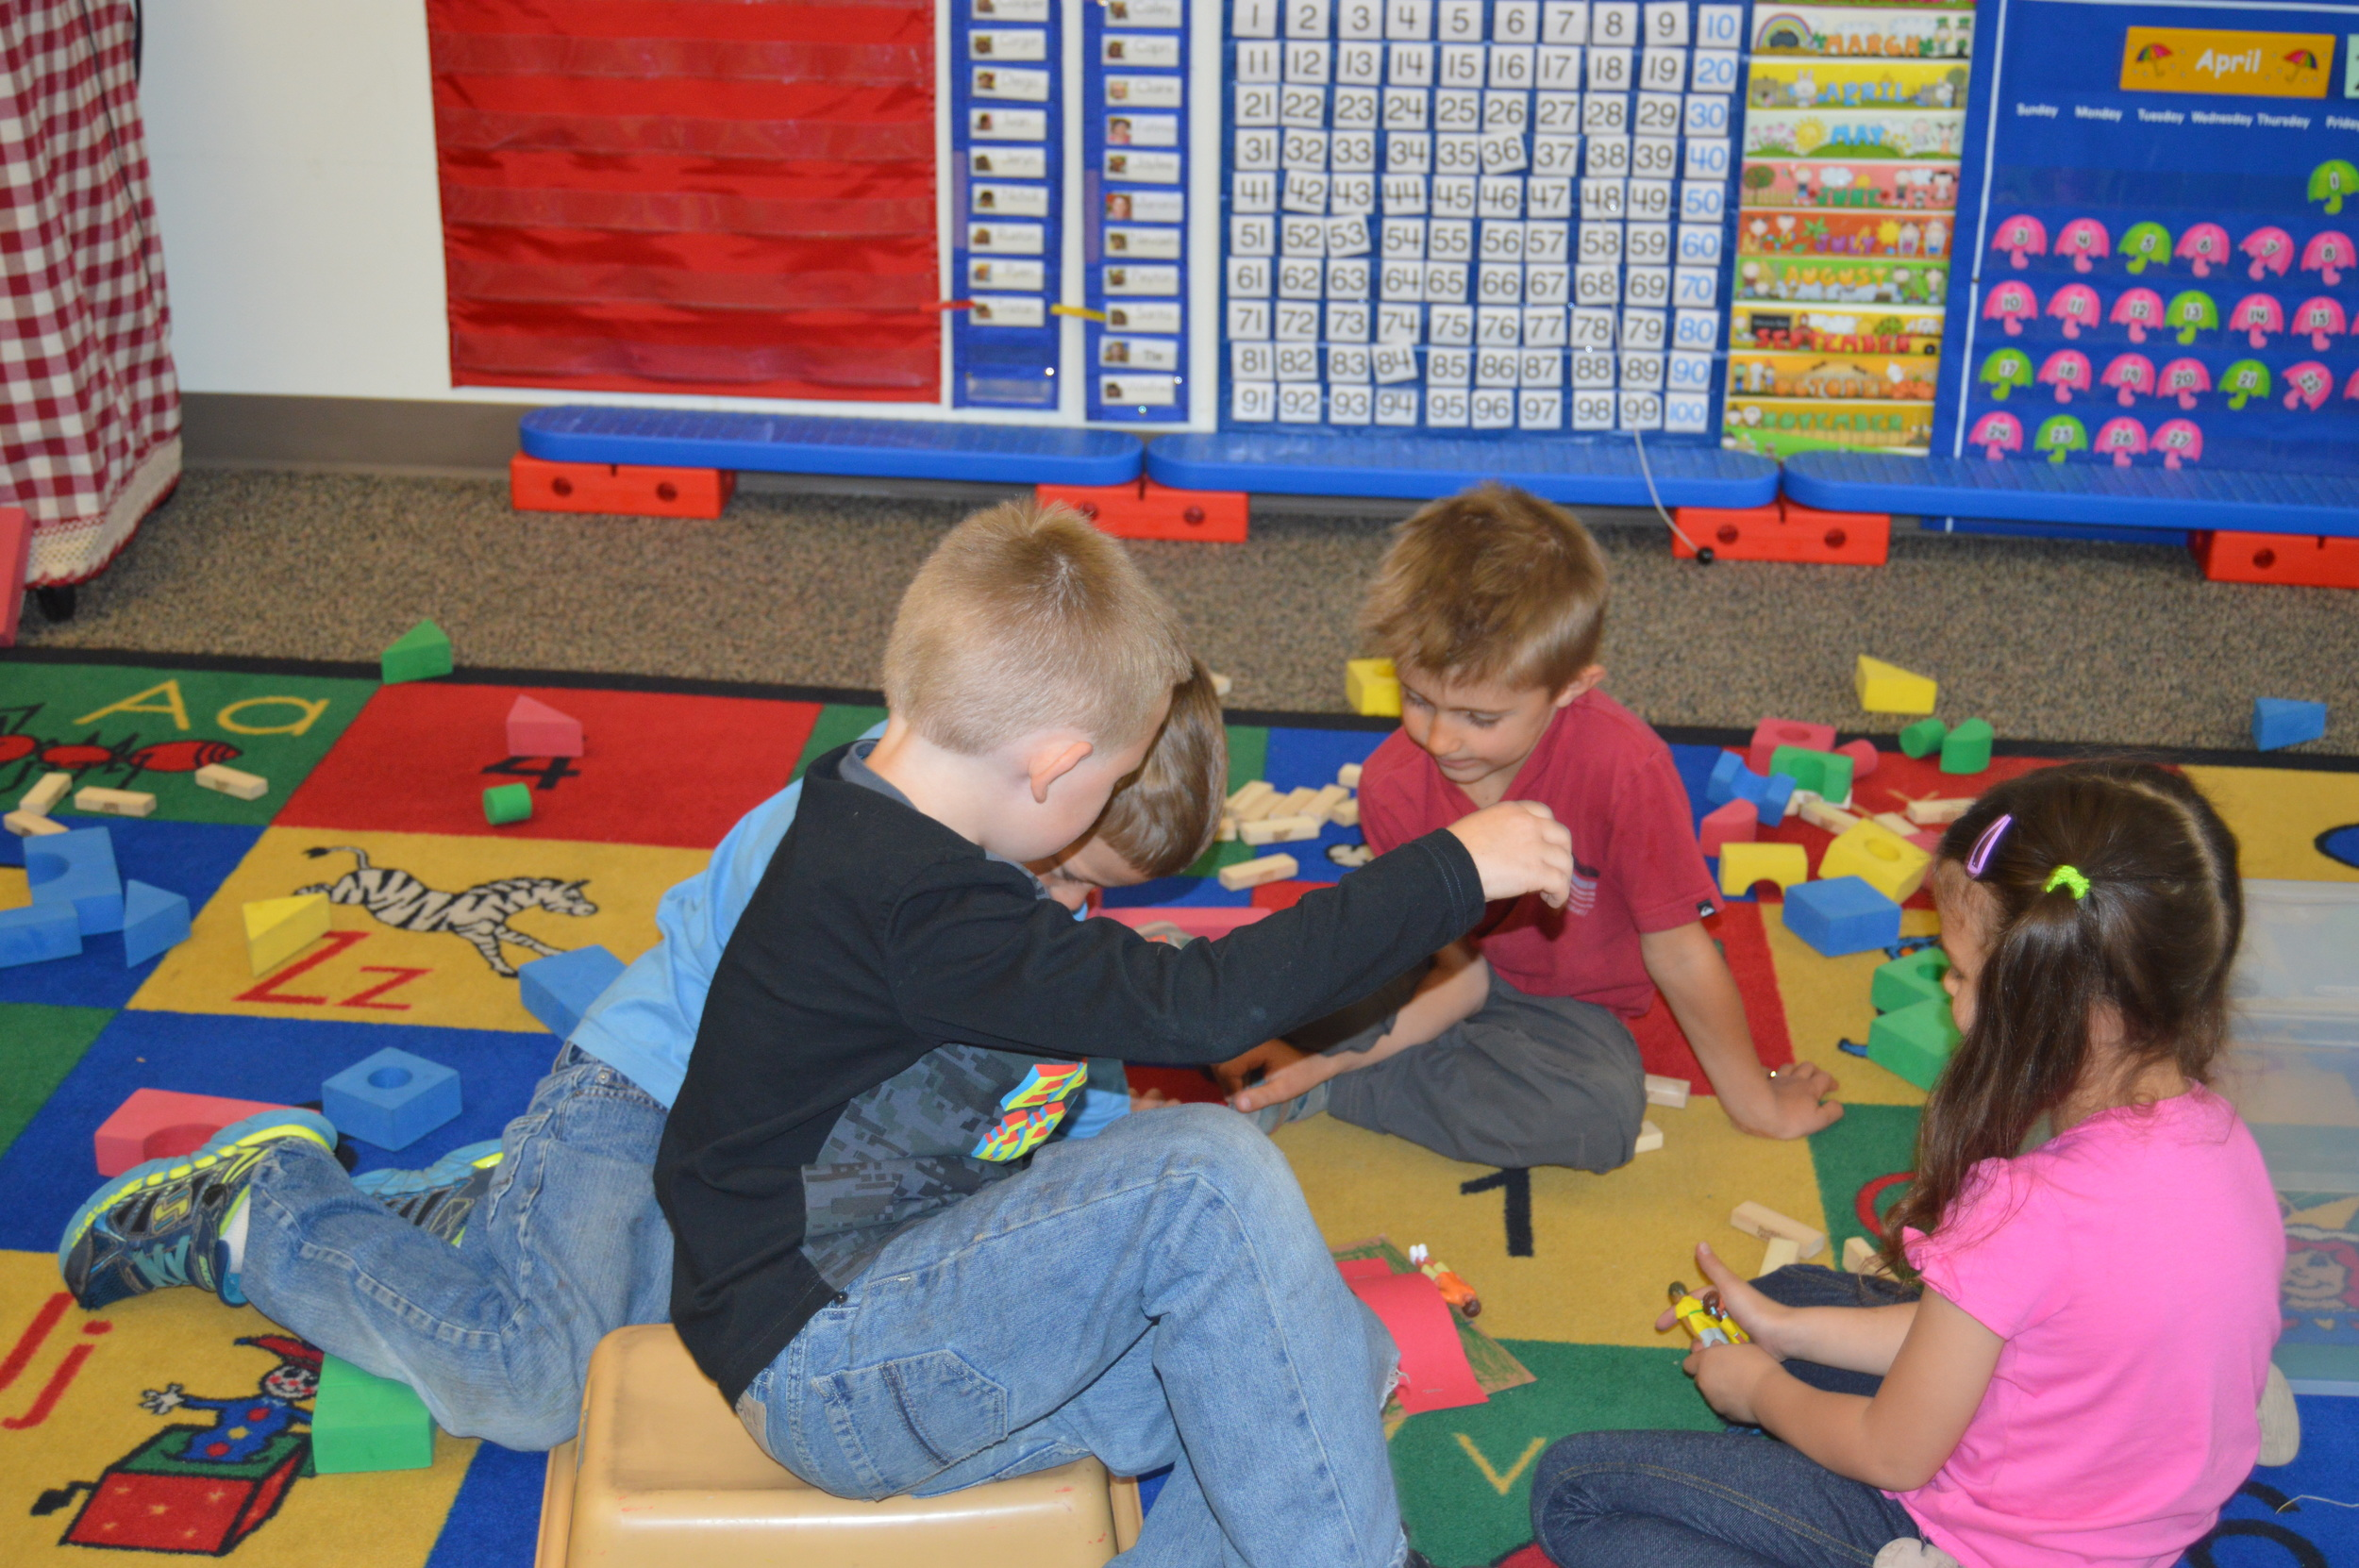 Kindergartners enjoying age-appropriate play.